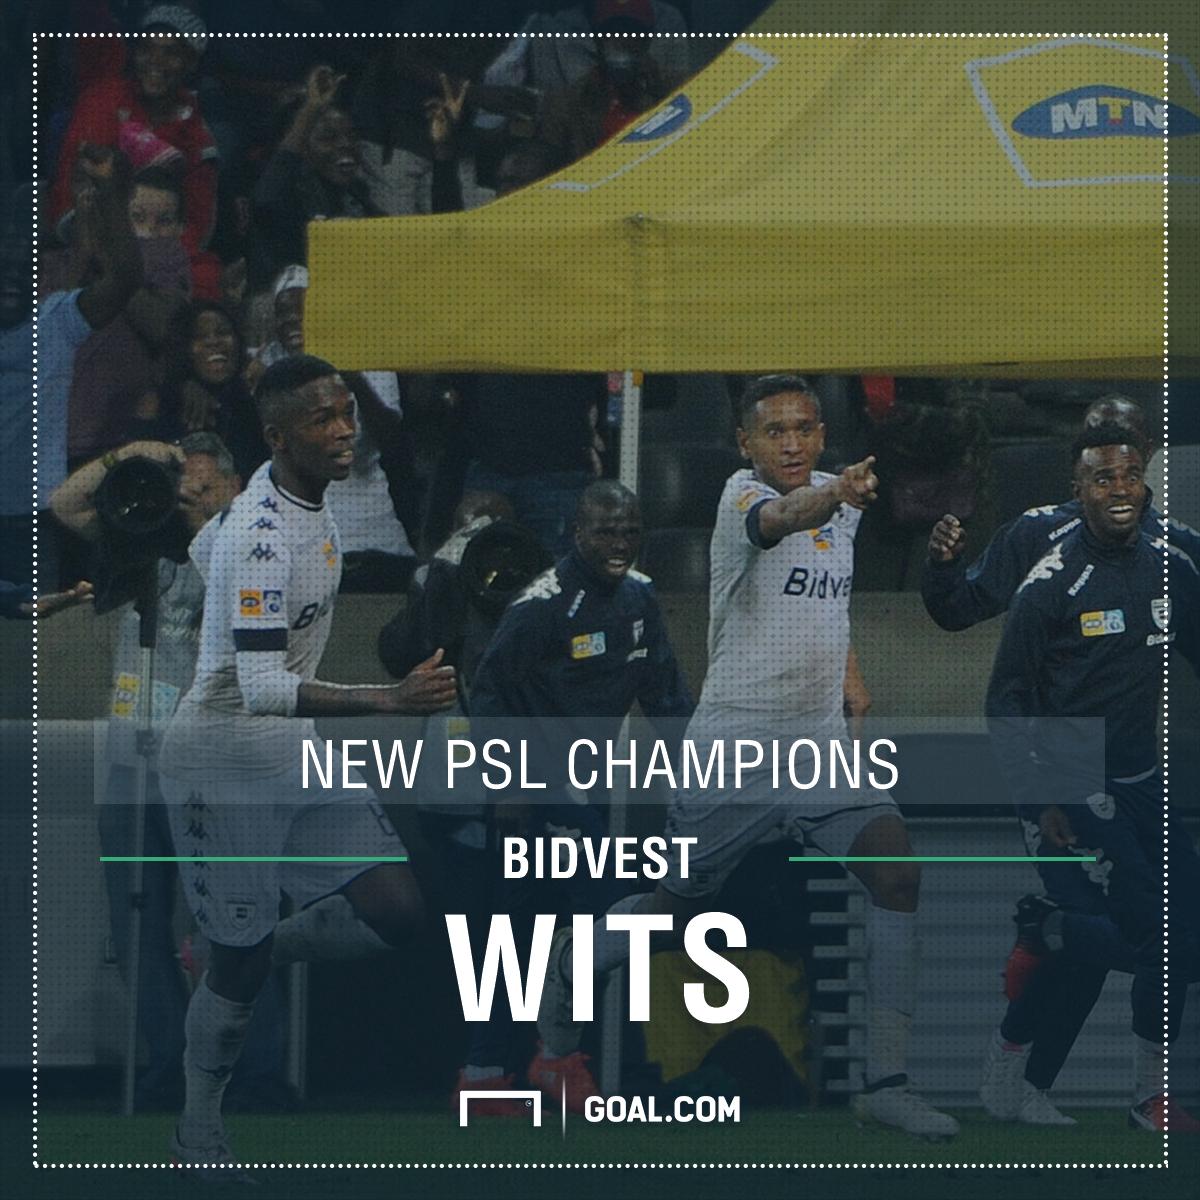 Bidvest Wits win PSL title - poster